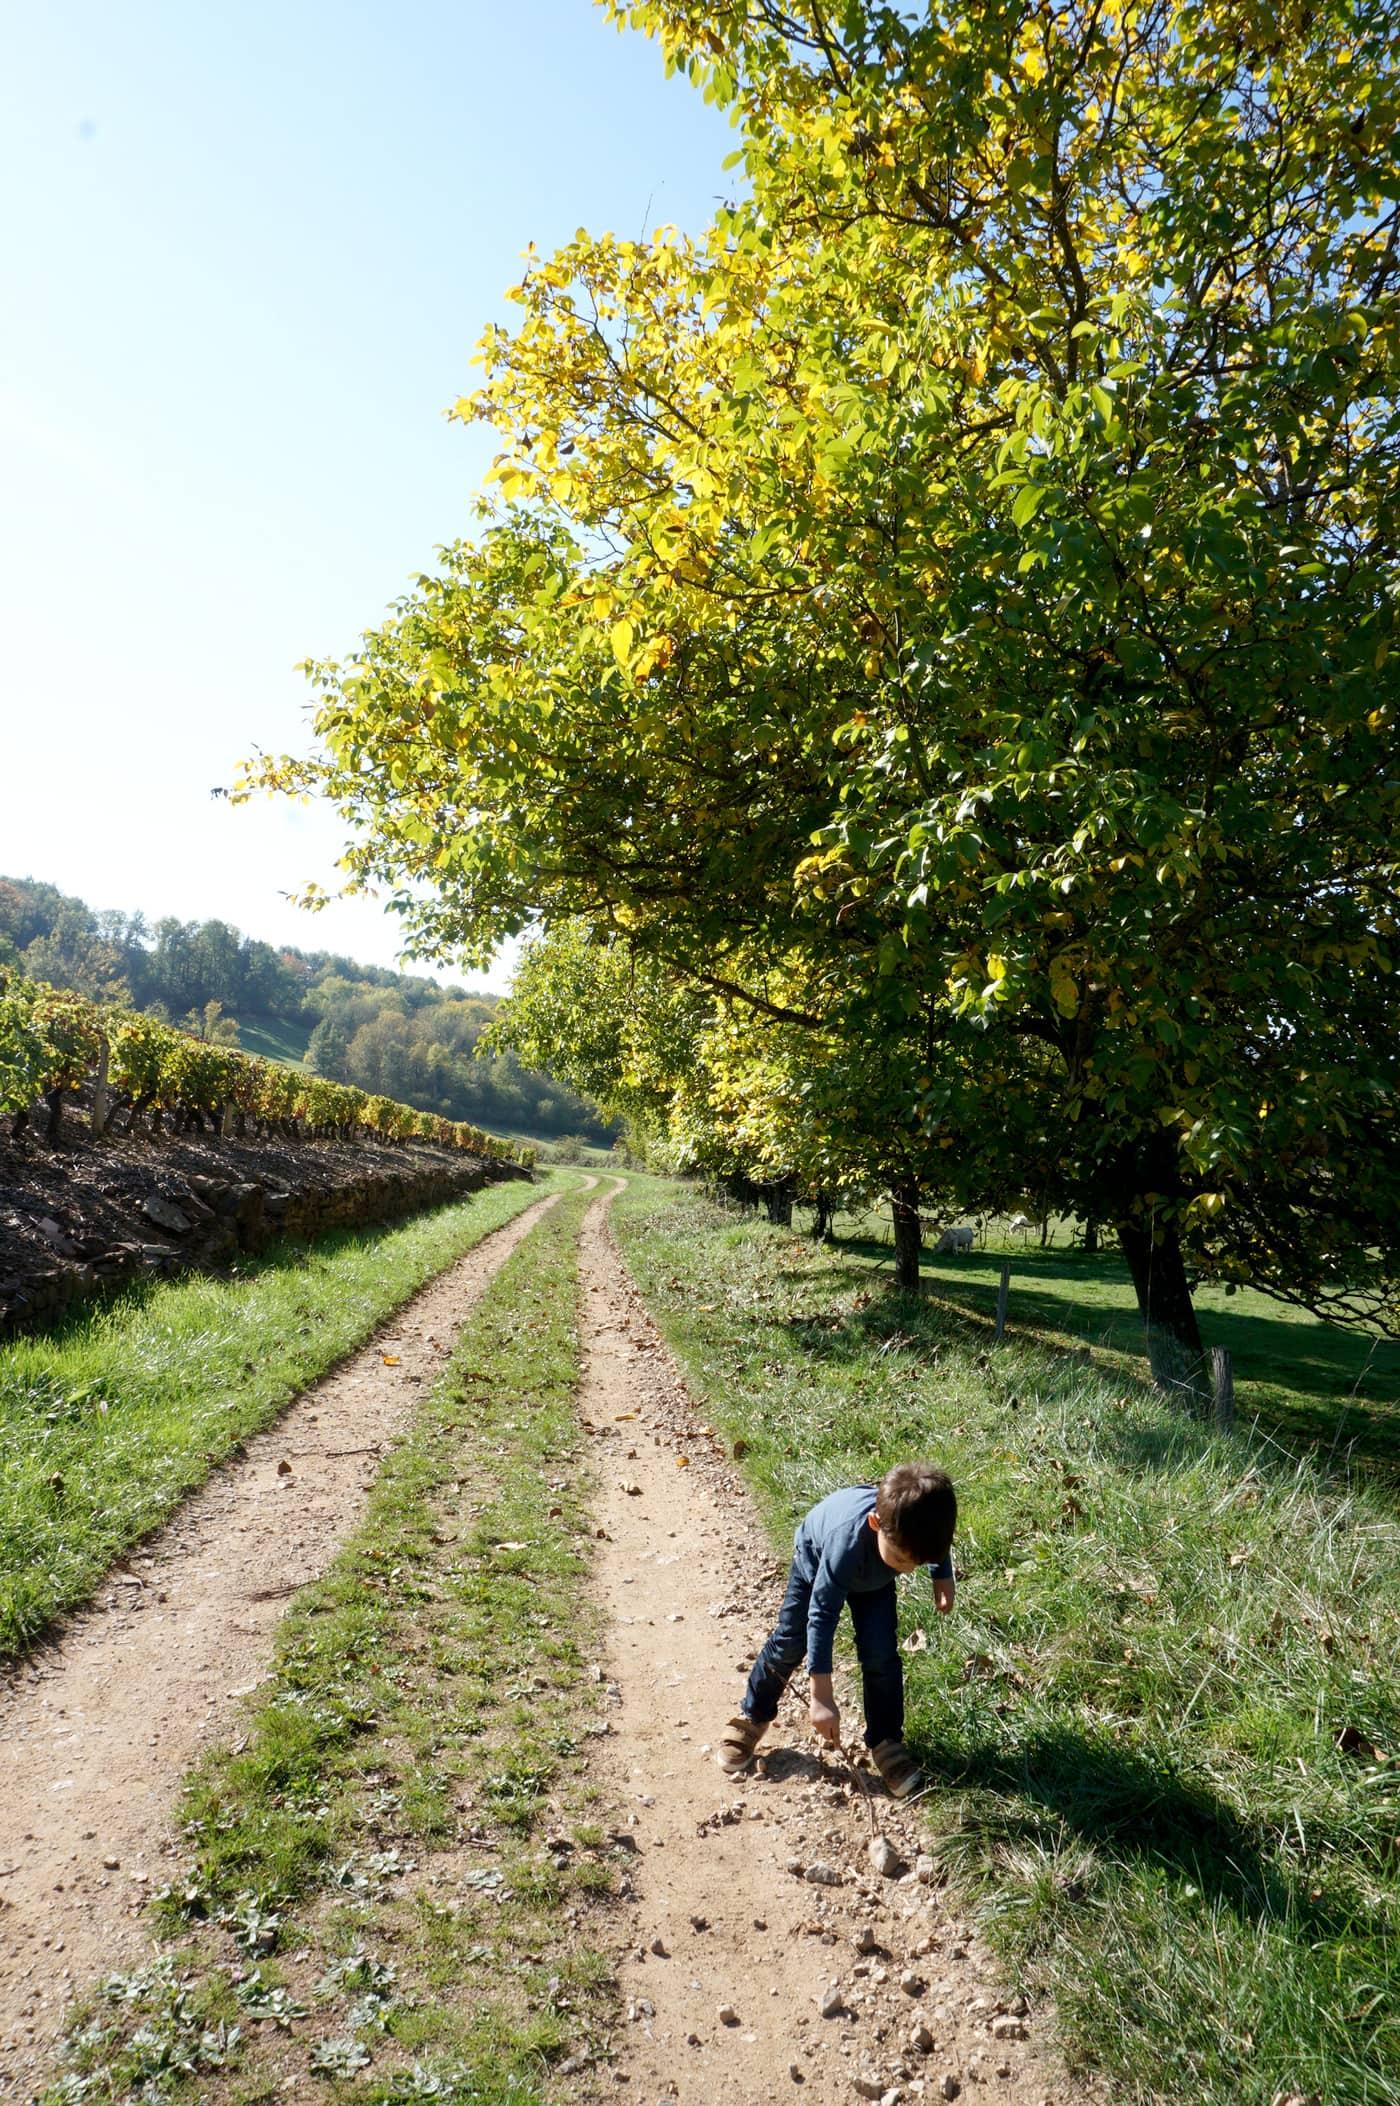 Balade autour de Lyon : le Beaujolais en automne